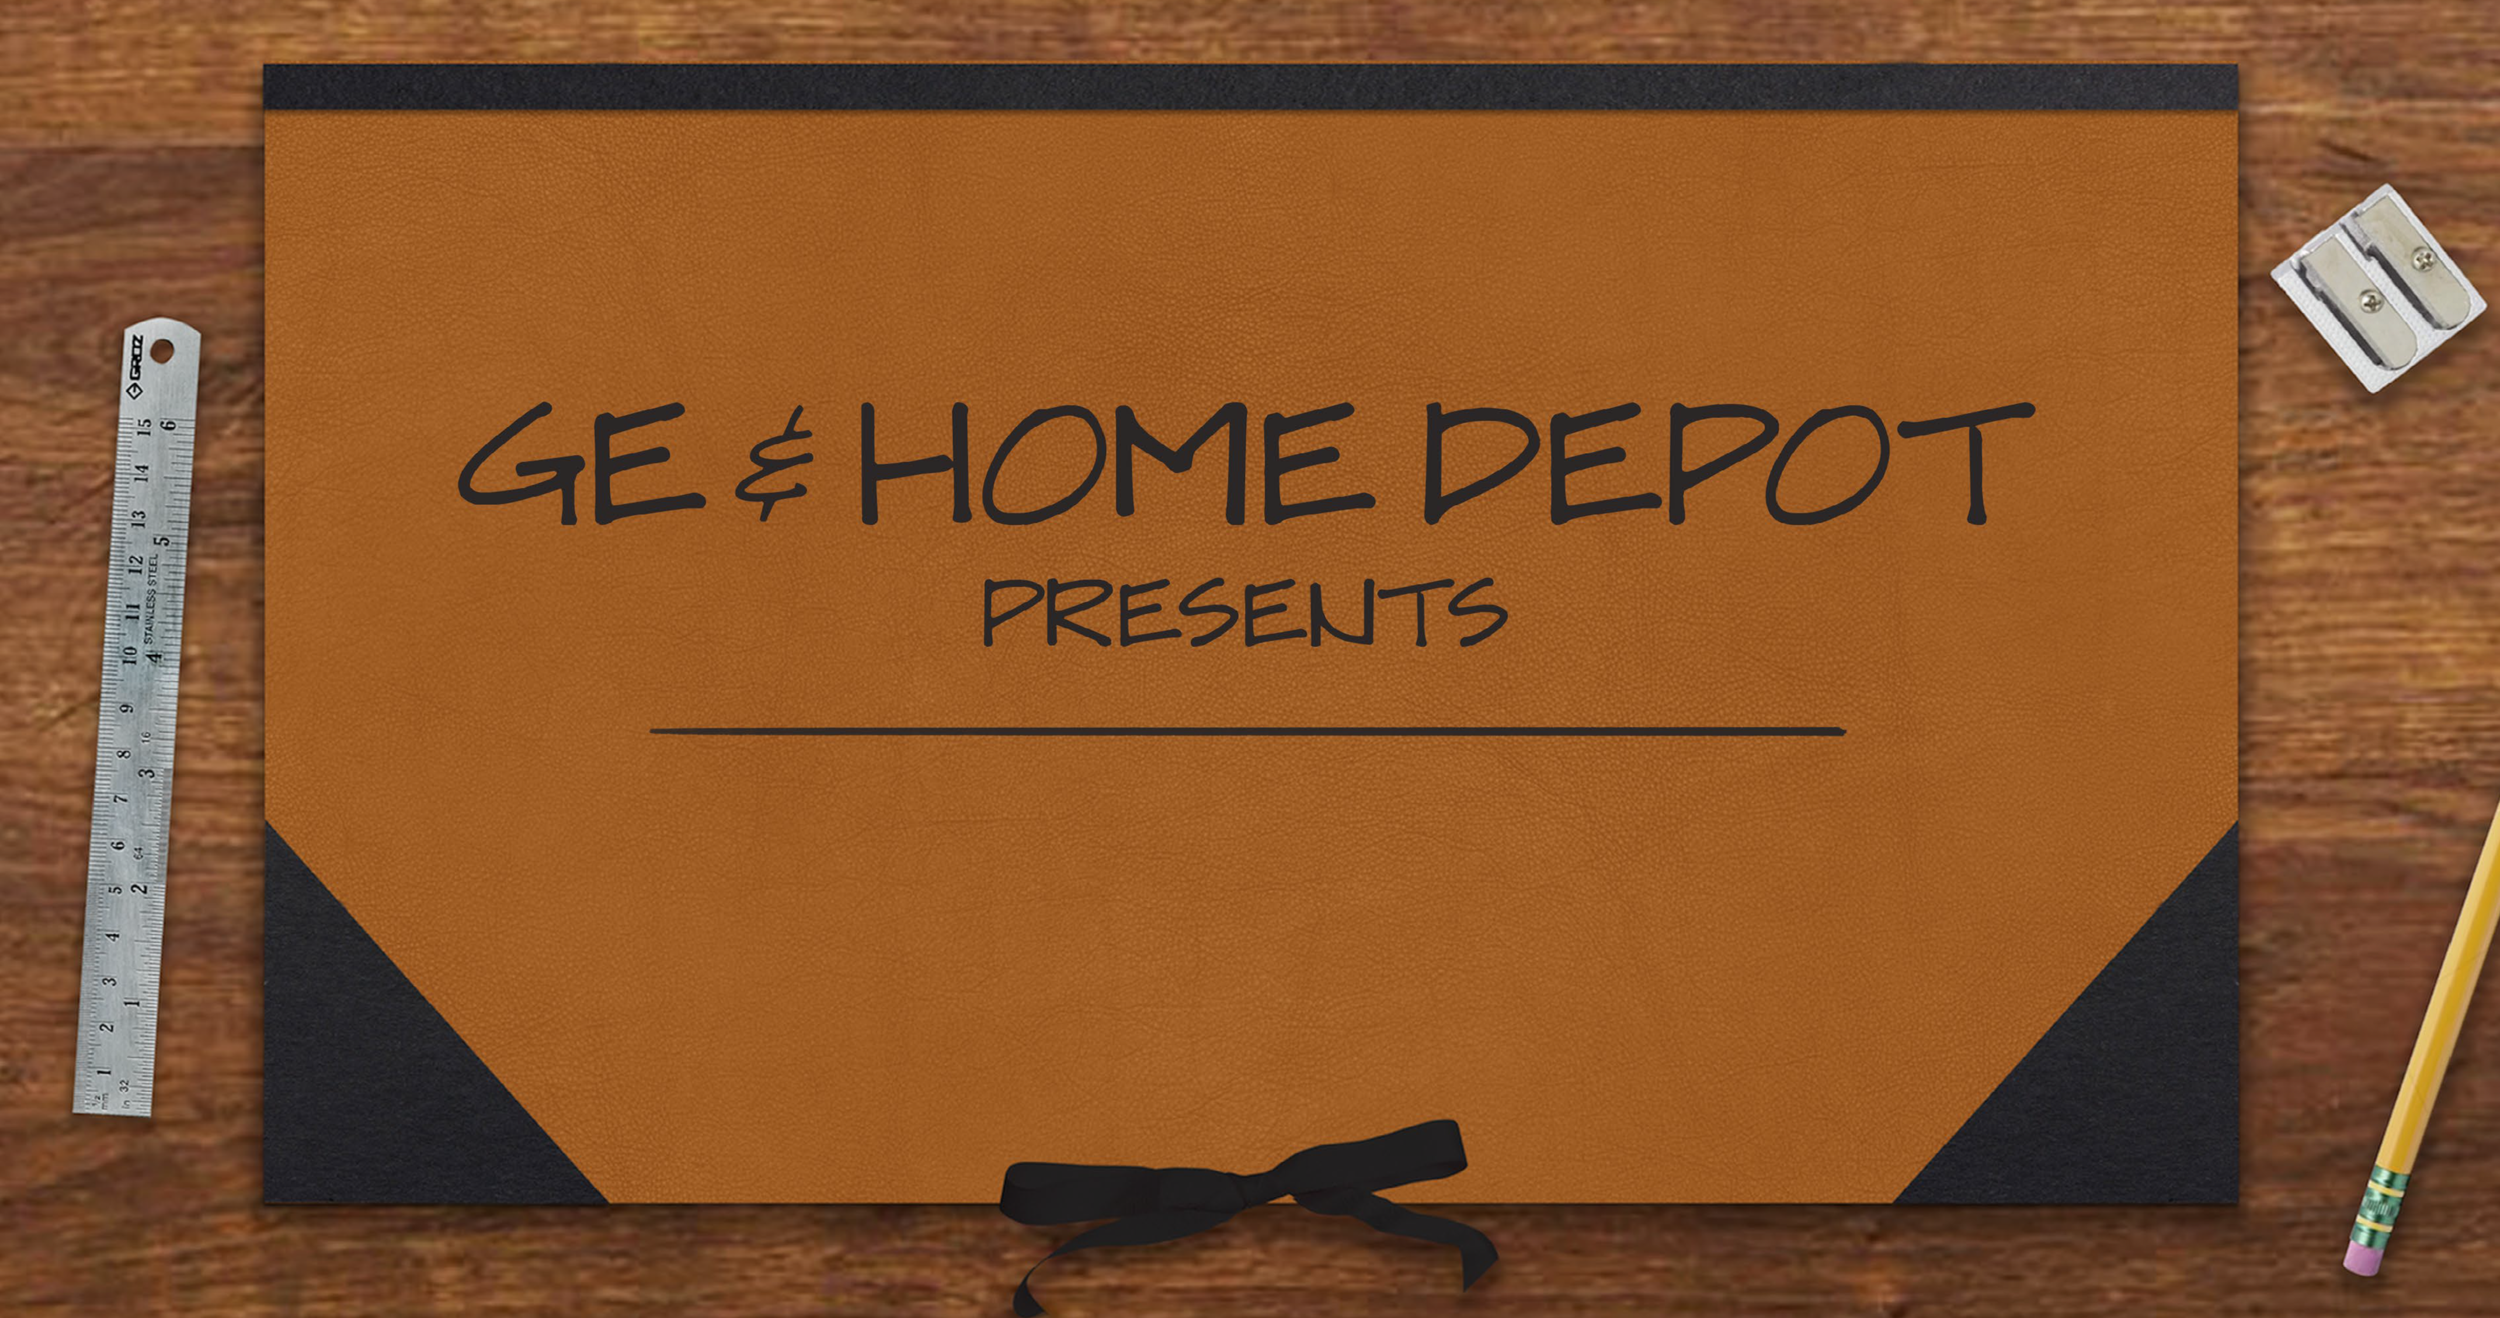 HomeDepot_GE_DesignTips_0504-3.png